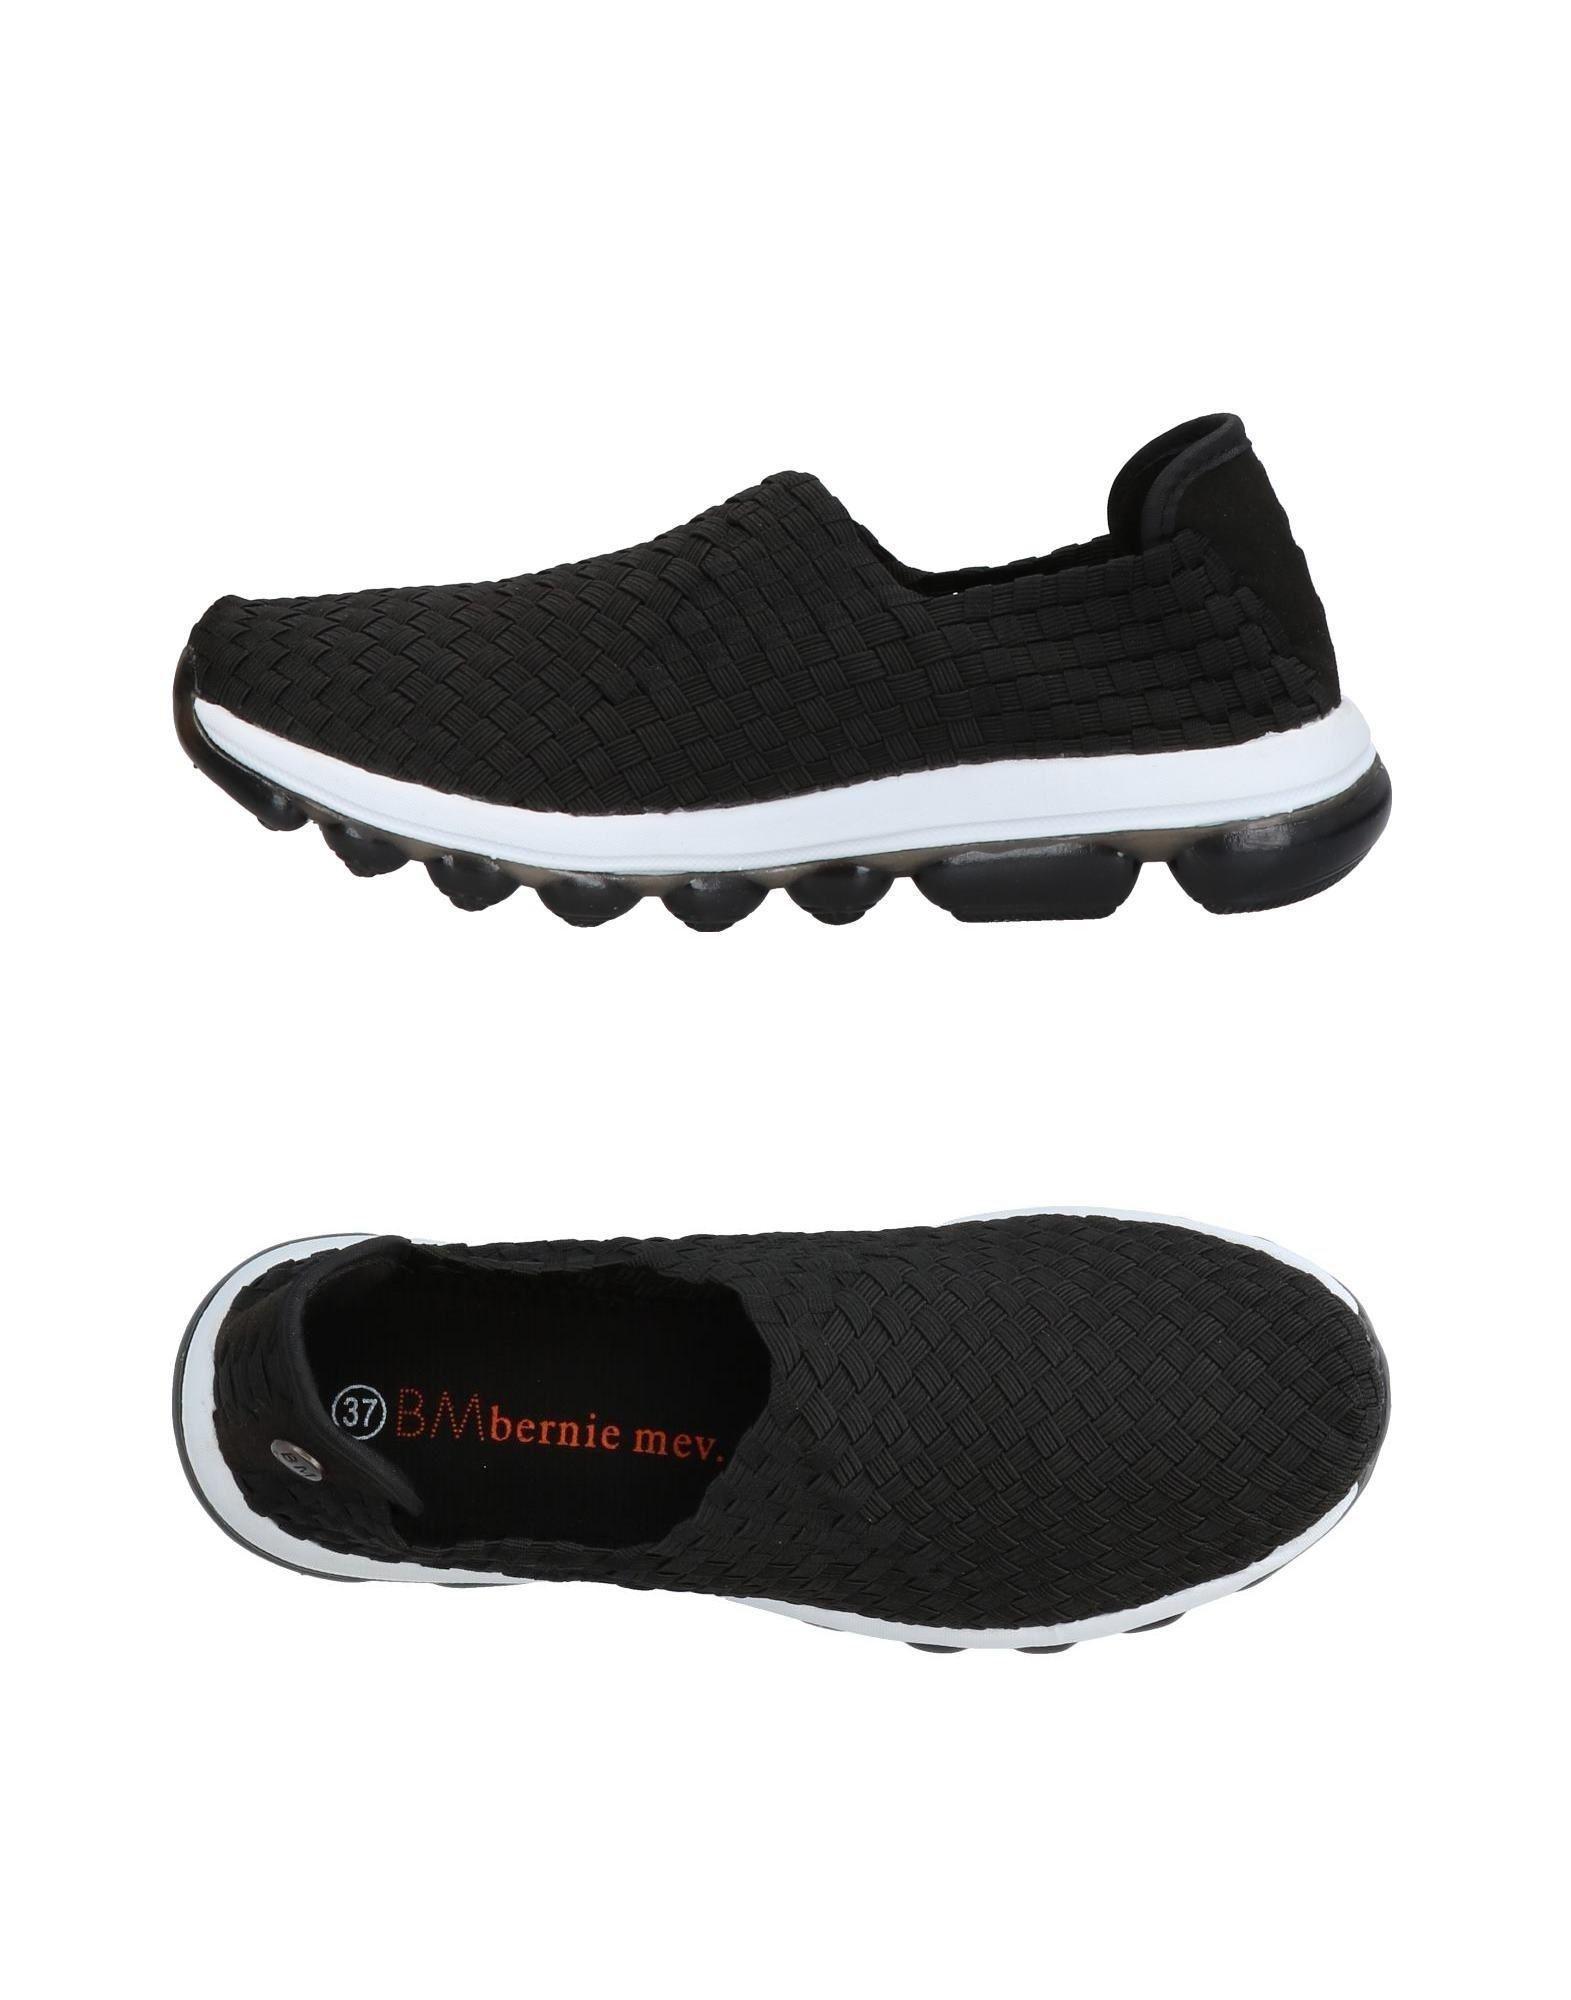 Bernie Mev. Bernie Mev. Low-tops & Sneakers Bas-tops Et Chaussures De Sport fHPtJpU